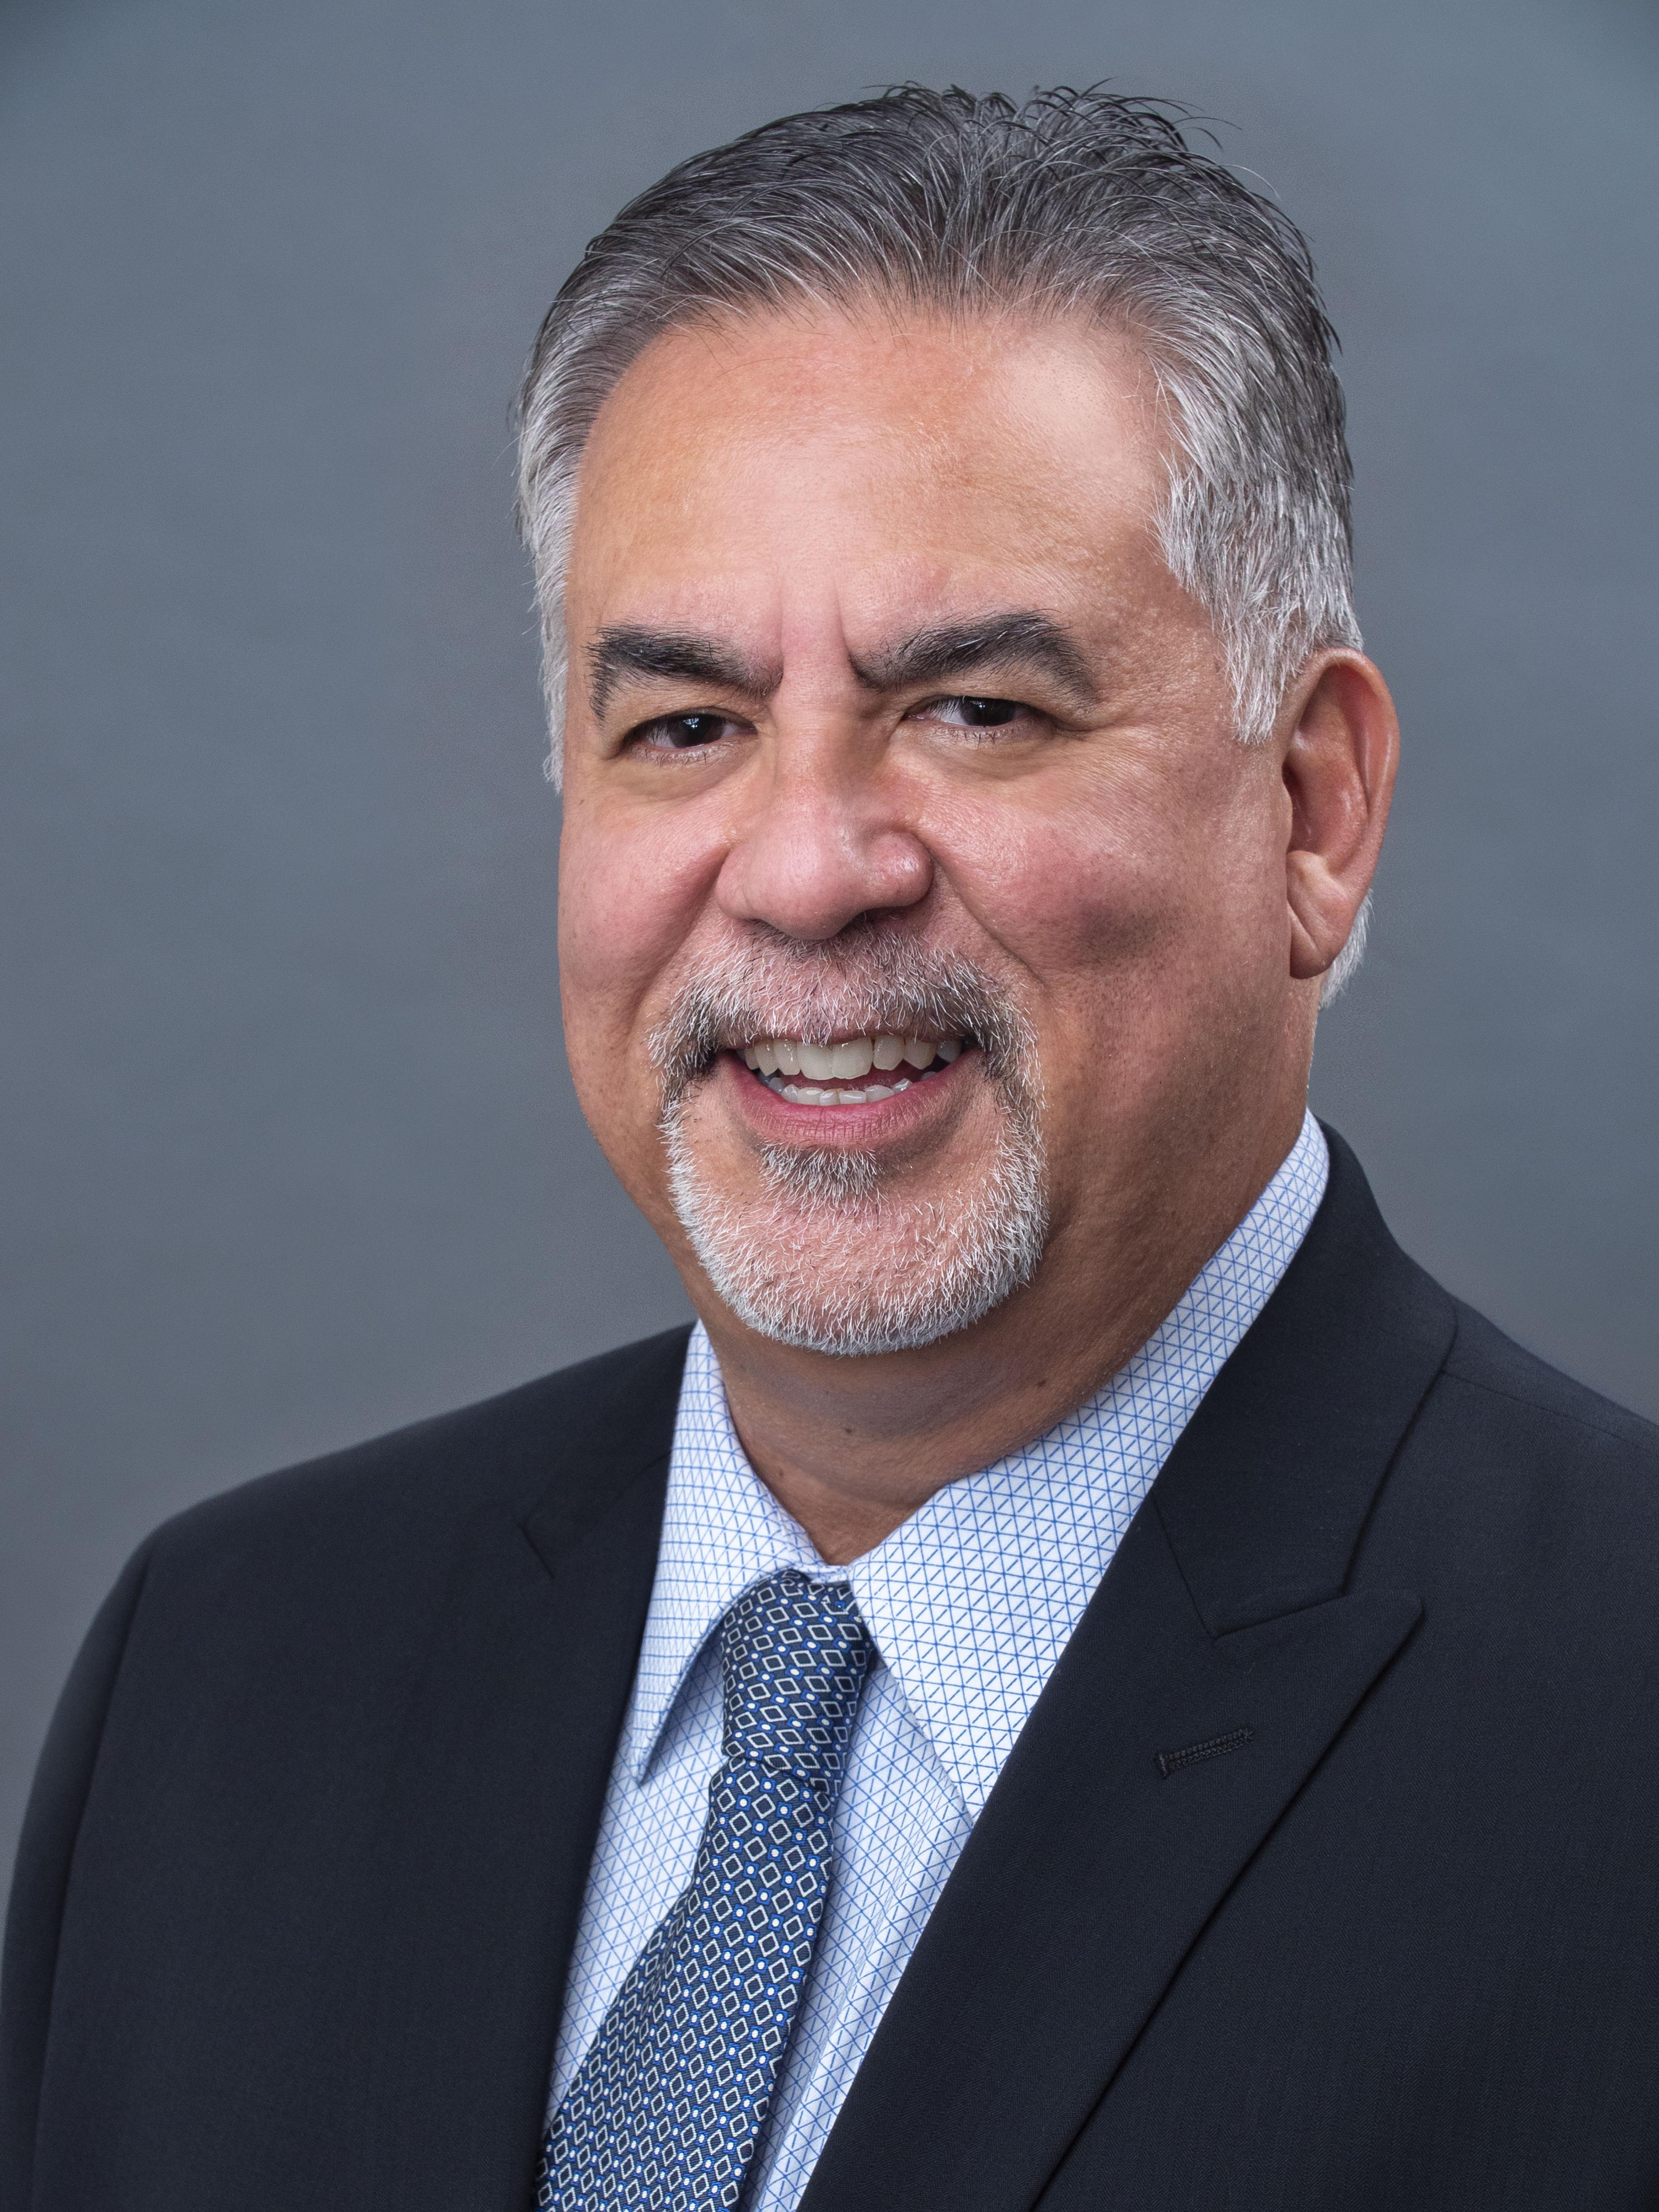 Robert Campbell - SVP Retail Operations